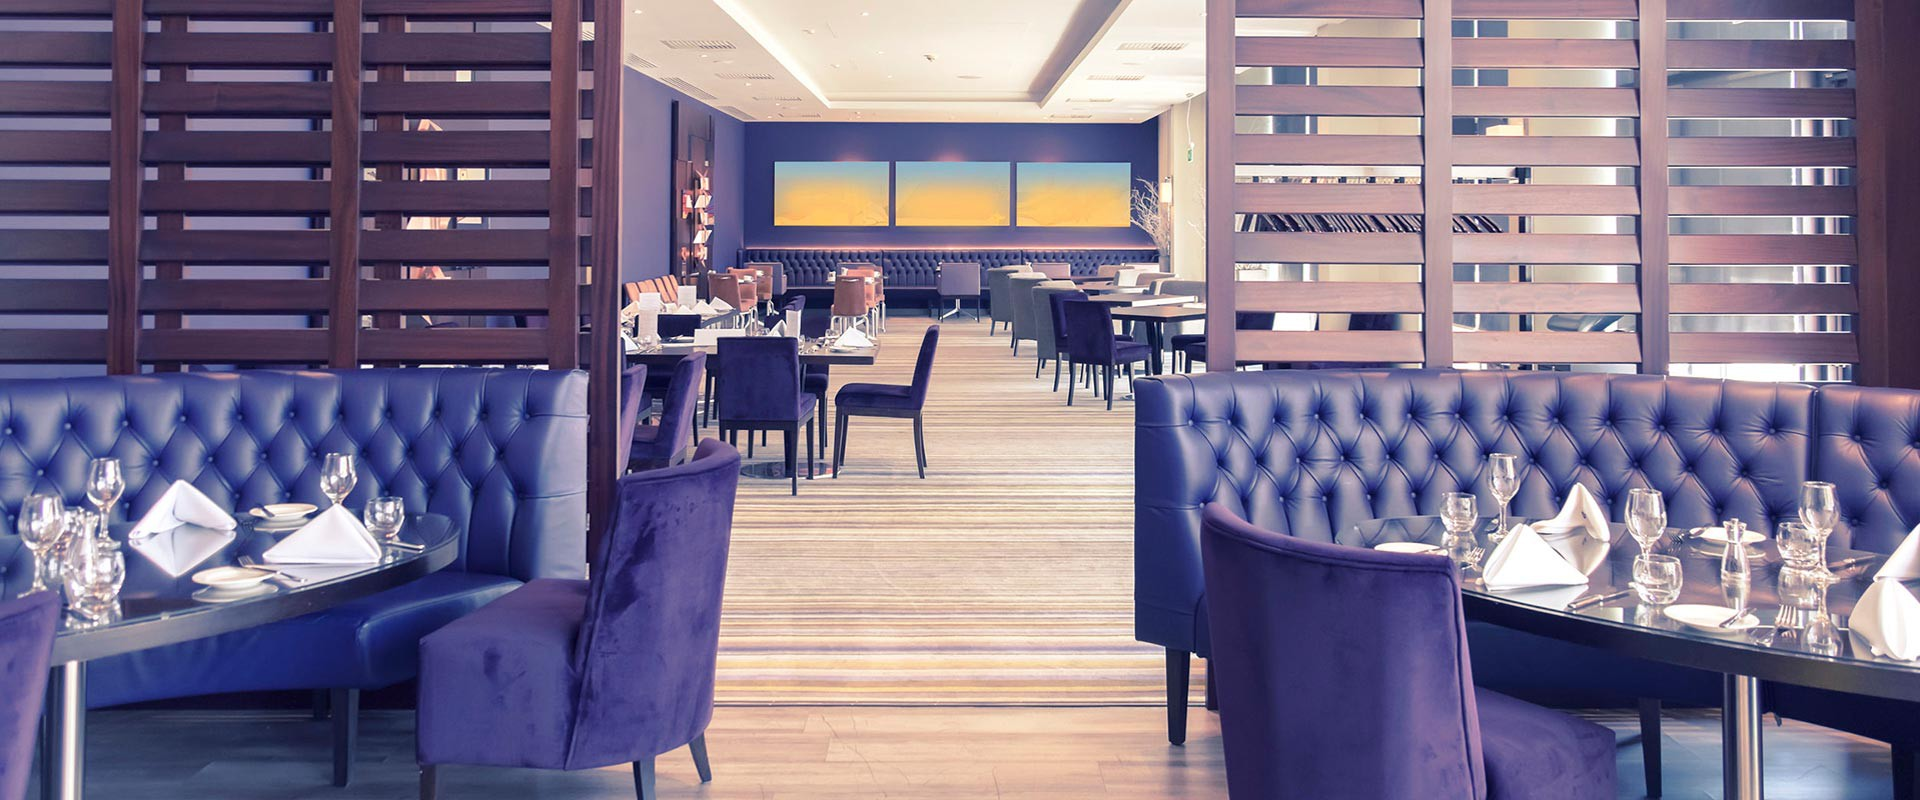 Custom furniture contractor Manchester UK